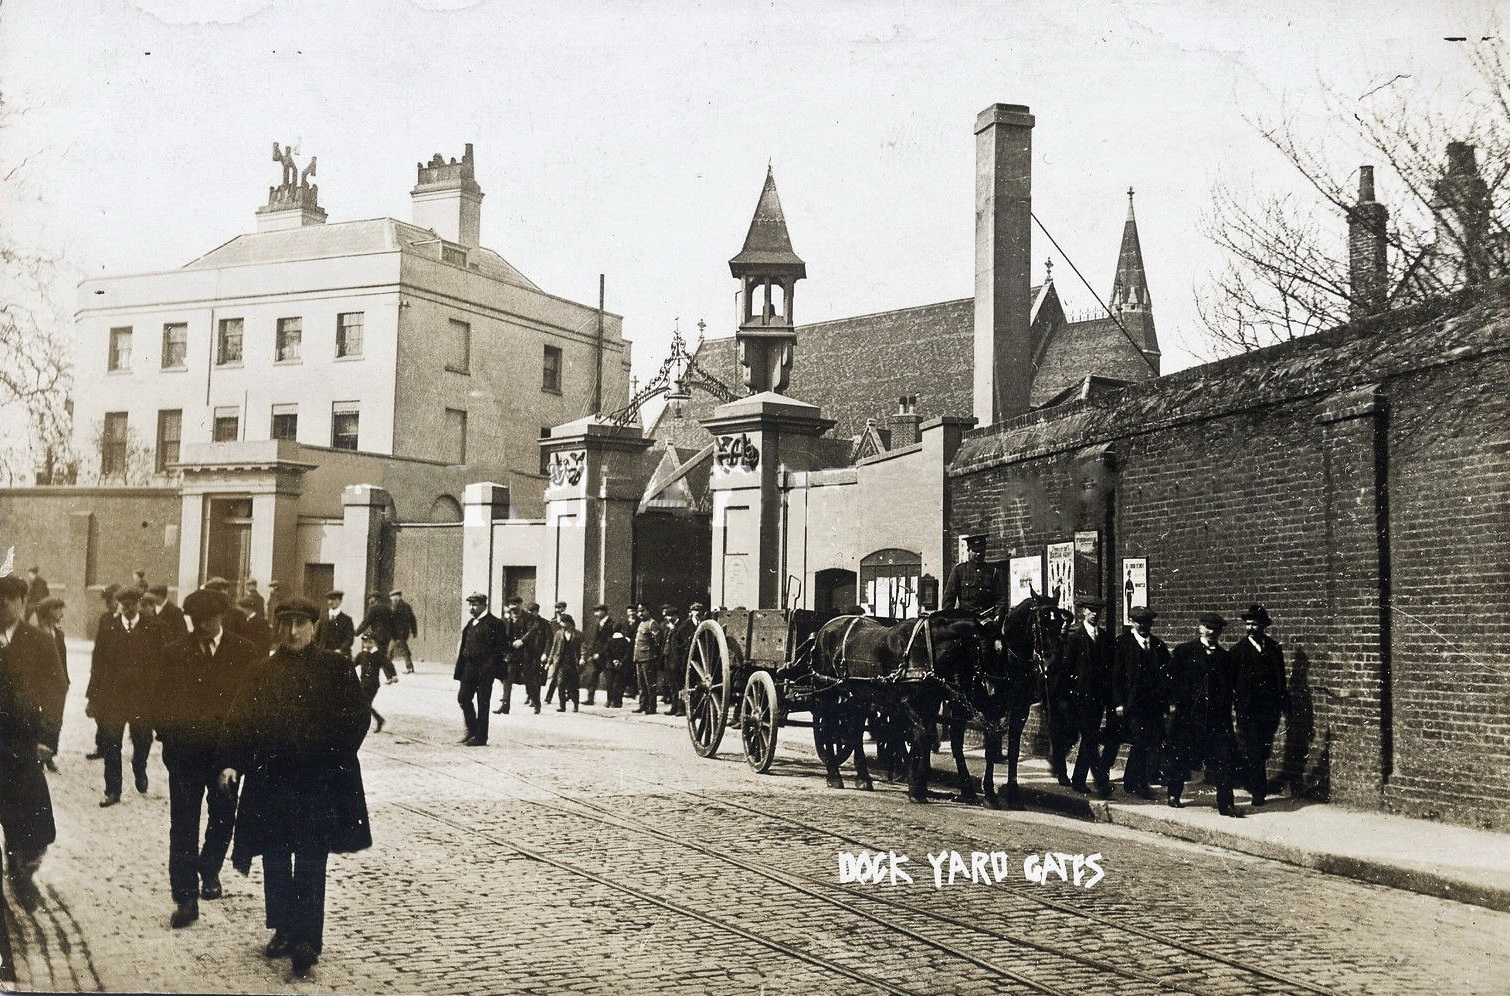 File:Woolwich Dockyard gates, ca 1900.jpg - Wikimedia Commons